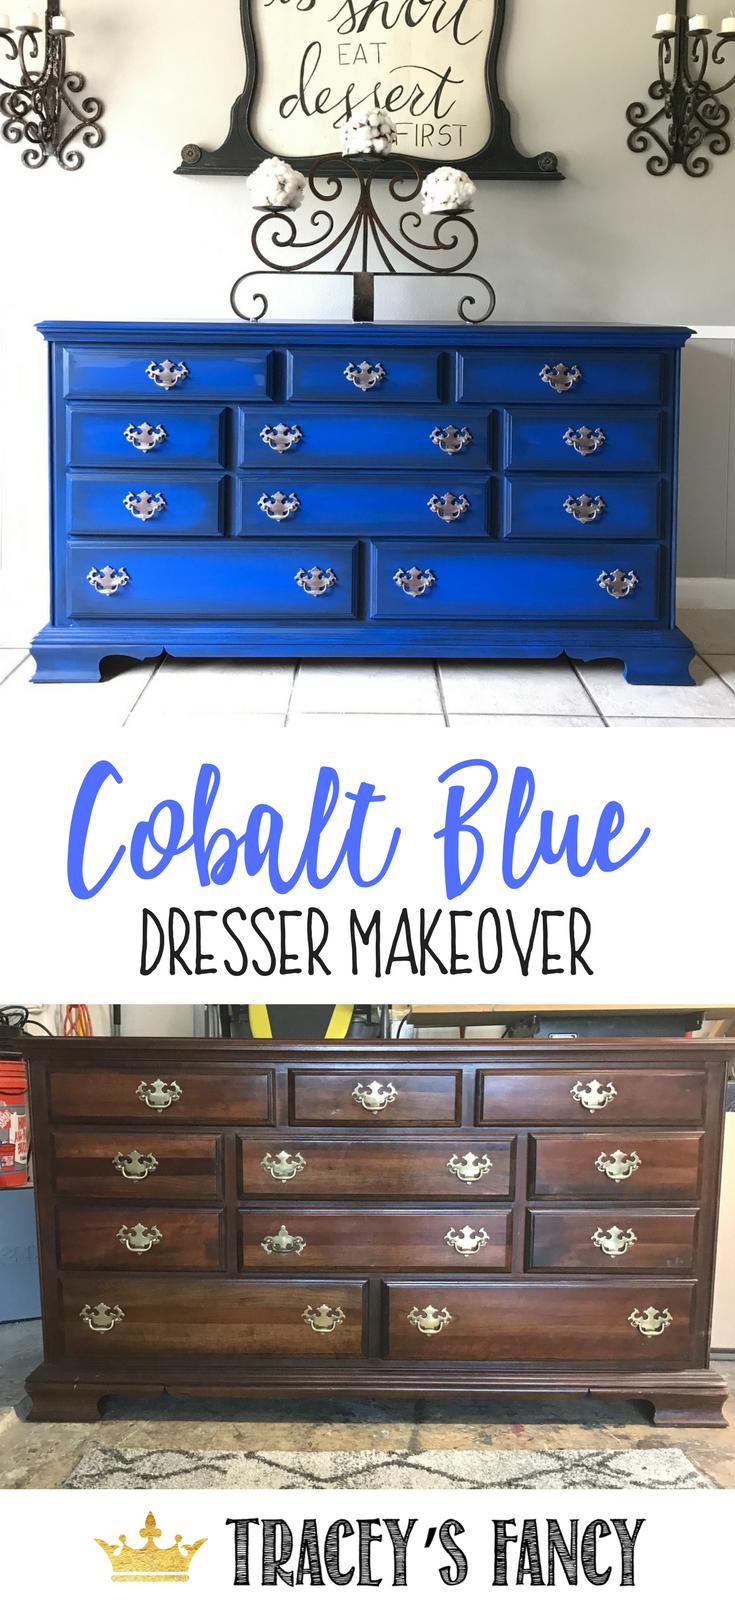 Cobalt Blue Dresser with Metallic Handles | Painted Antique ...